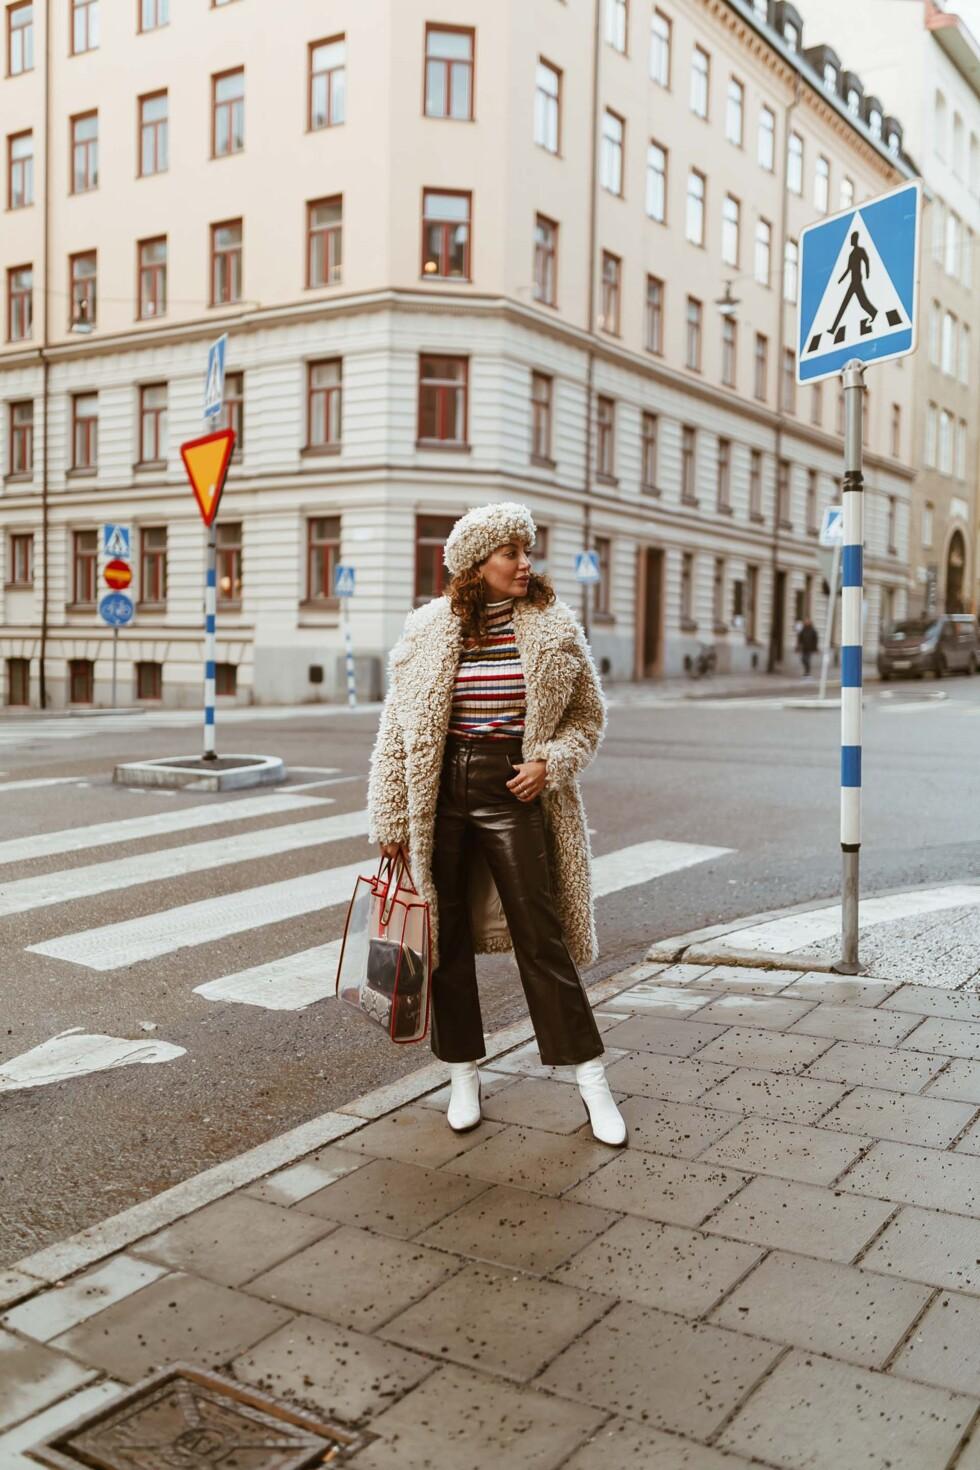 sara-che-monki-teddy-kappa-coat-faux-skinnbyxa-leather-pants-nelly-vit-boots-beck-sondergaard-väska-plast-tote-plastic-vinter-uniform-winter